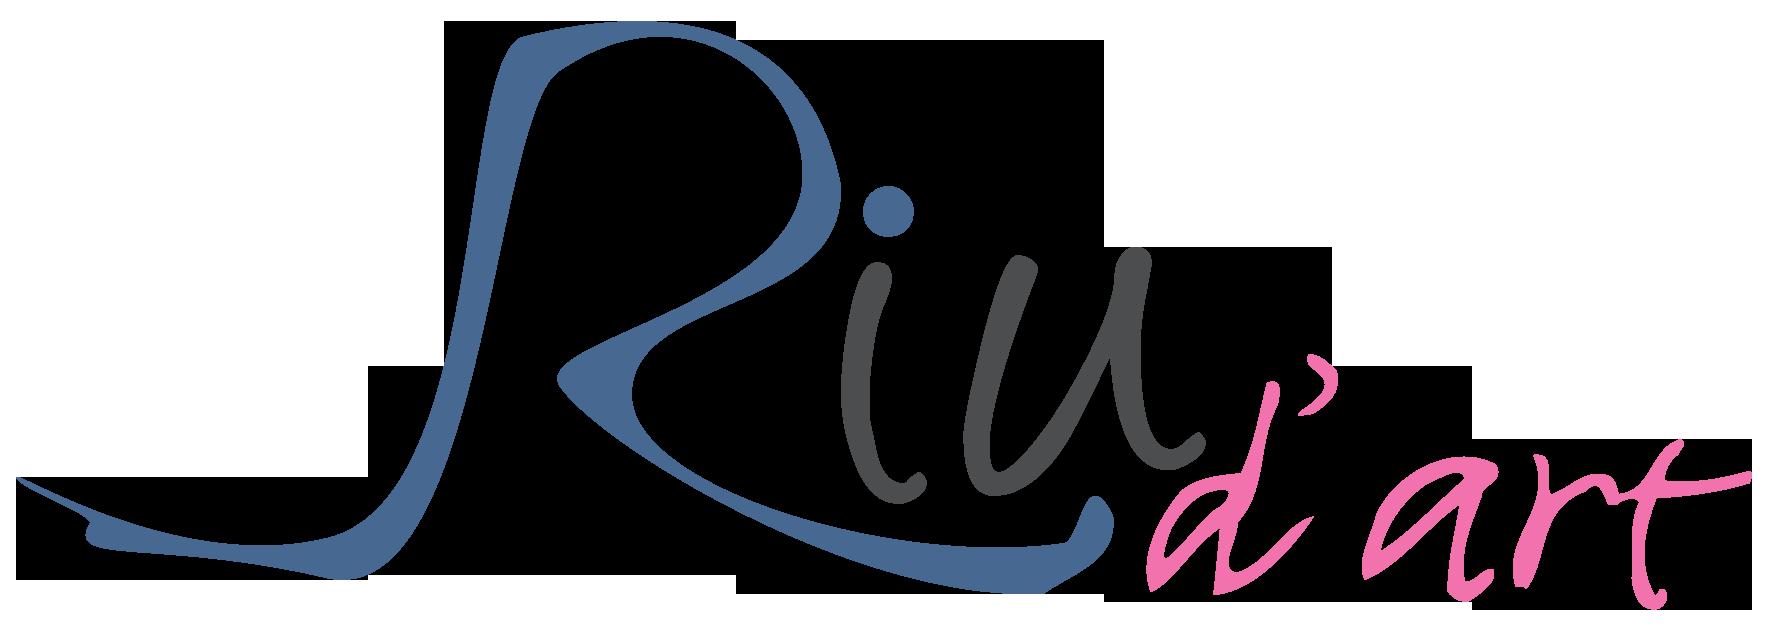 riu d'art logo